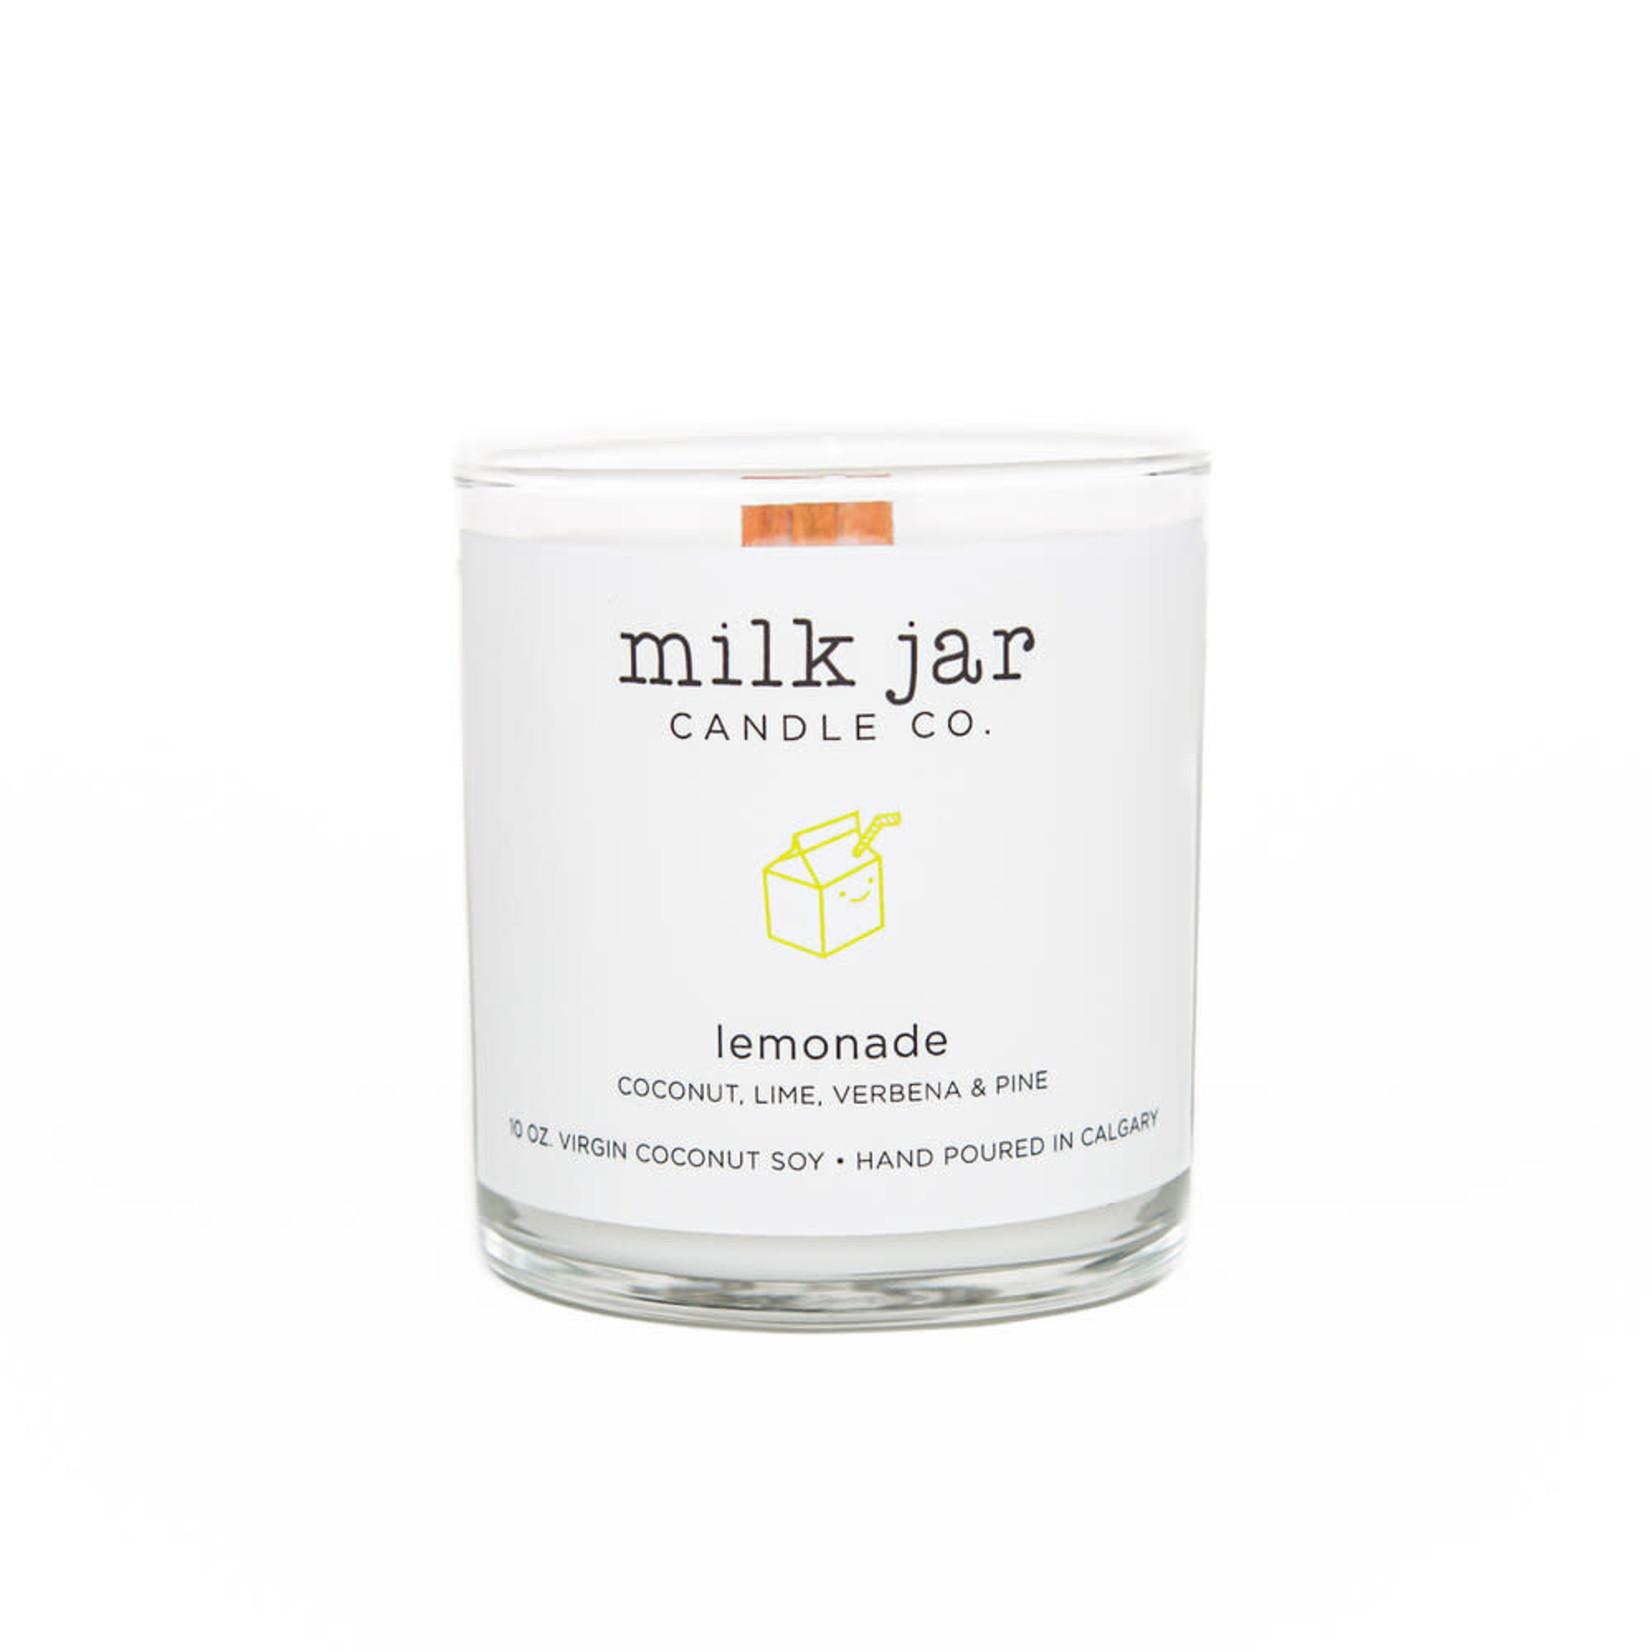 Milk Jar Candles Co. Lemonade Candle